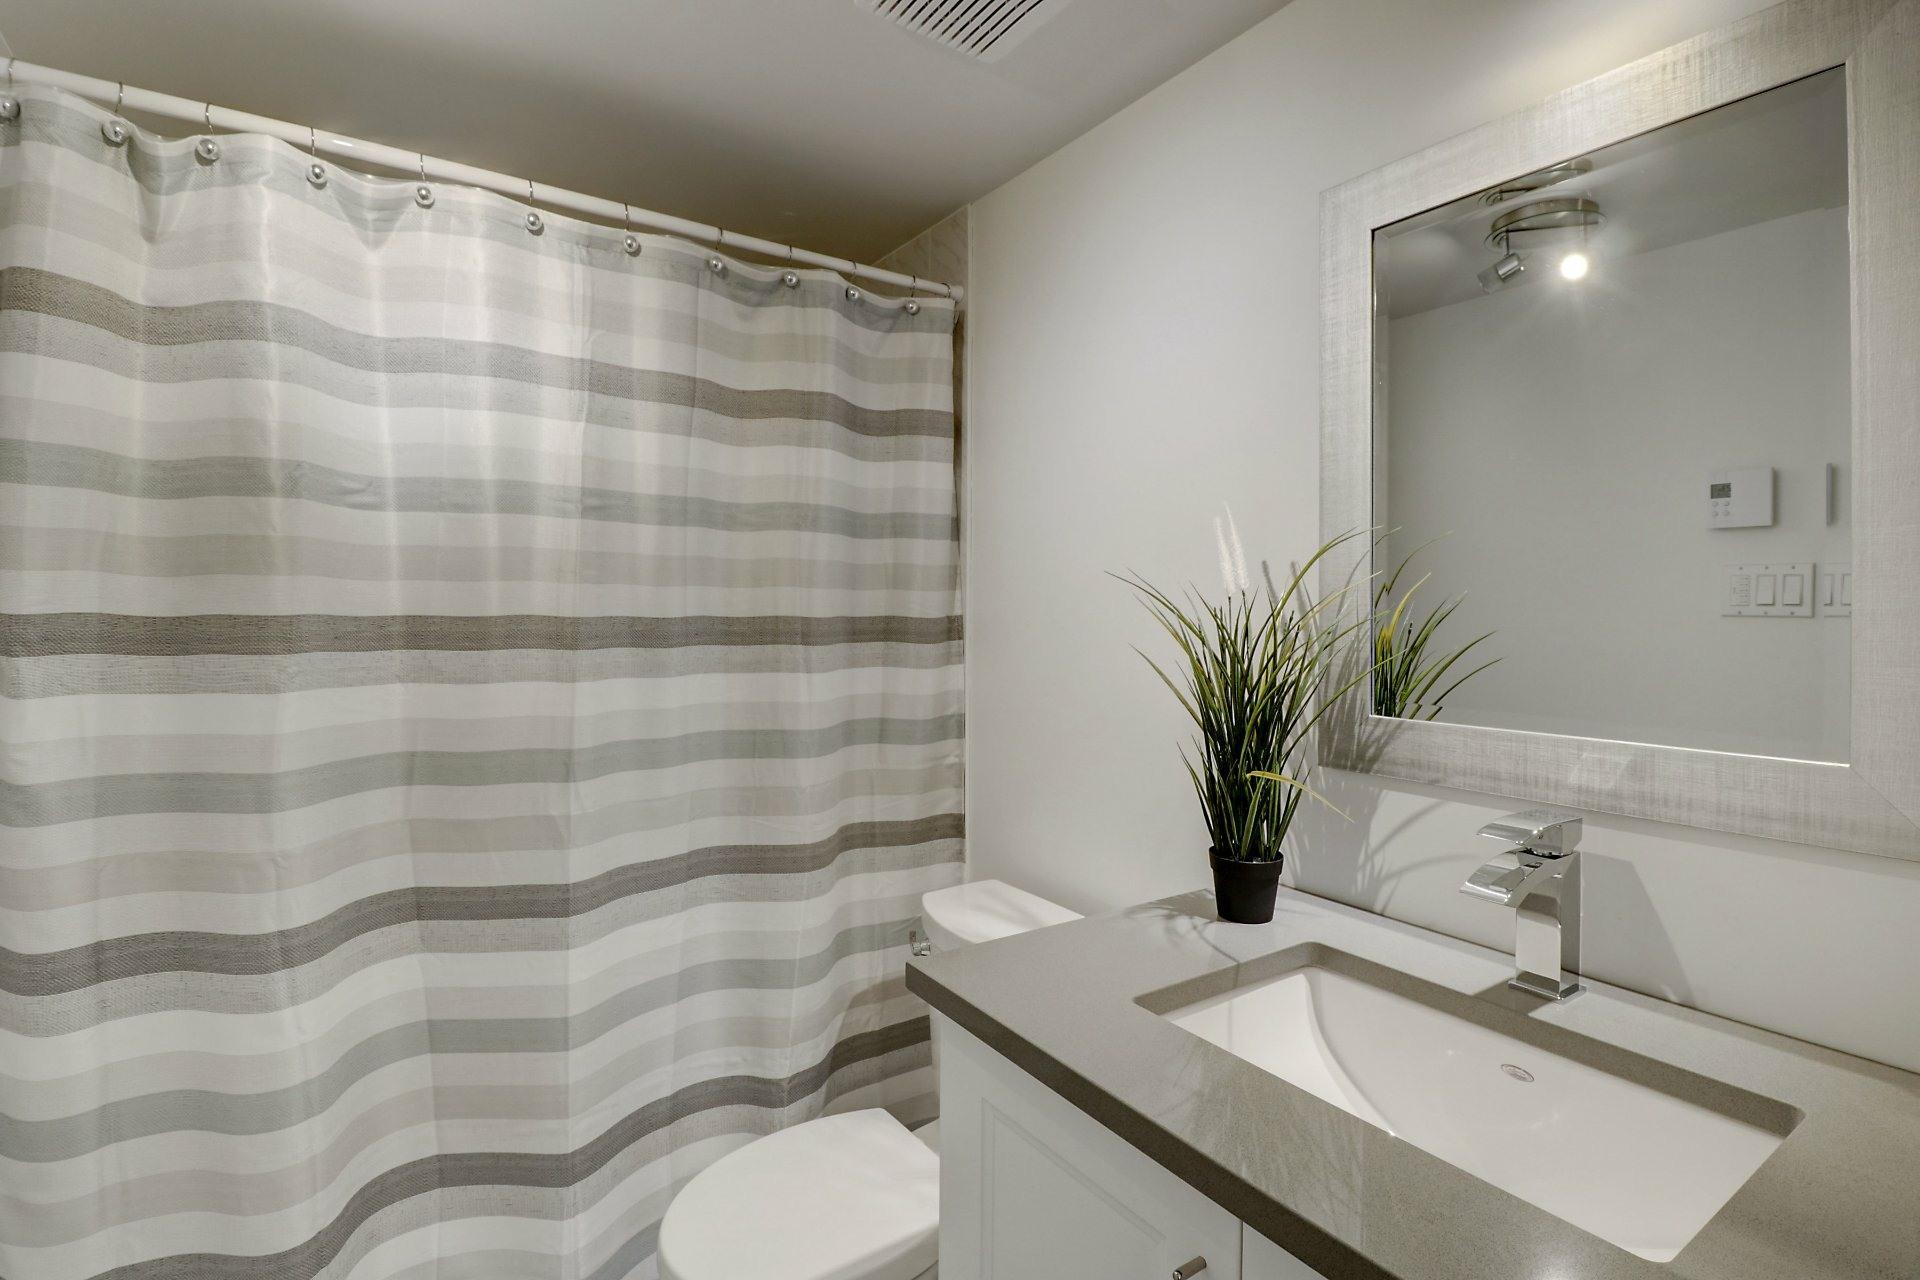 image 33 - Apartment For sale Beloeil - 9 rooms